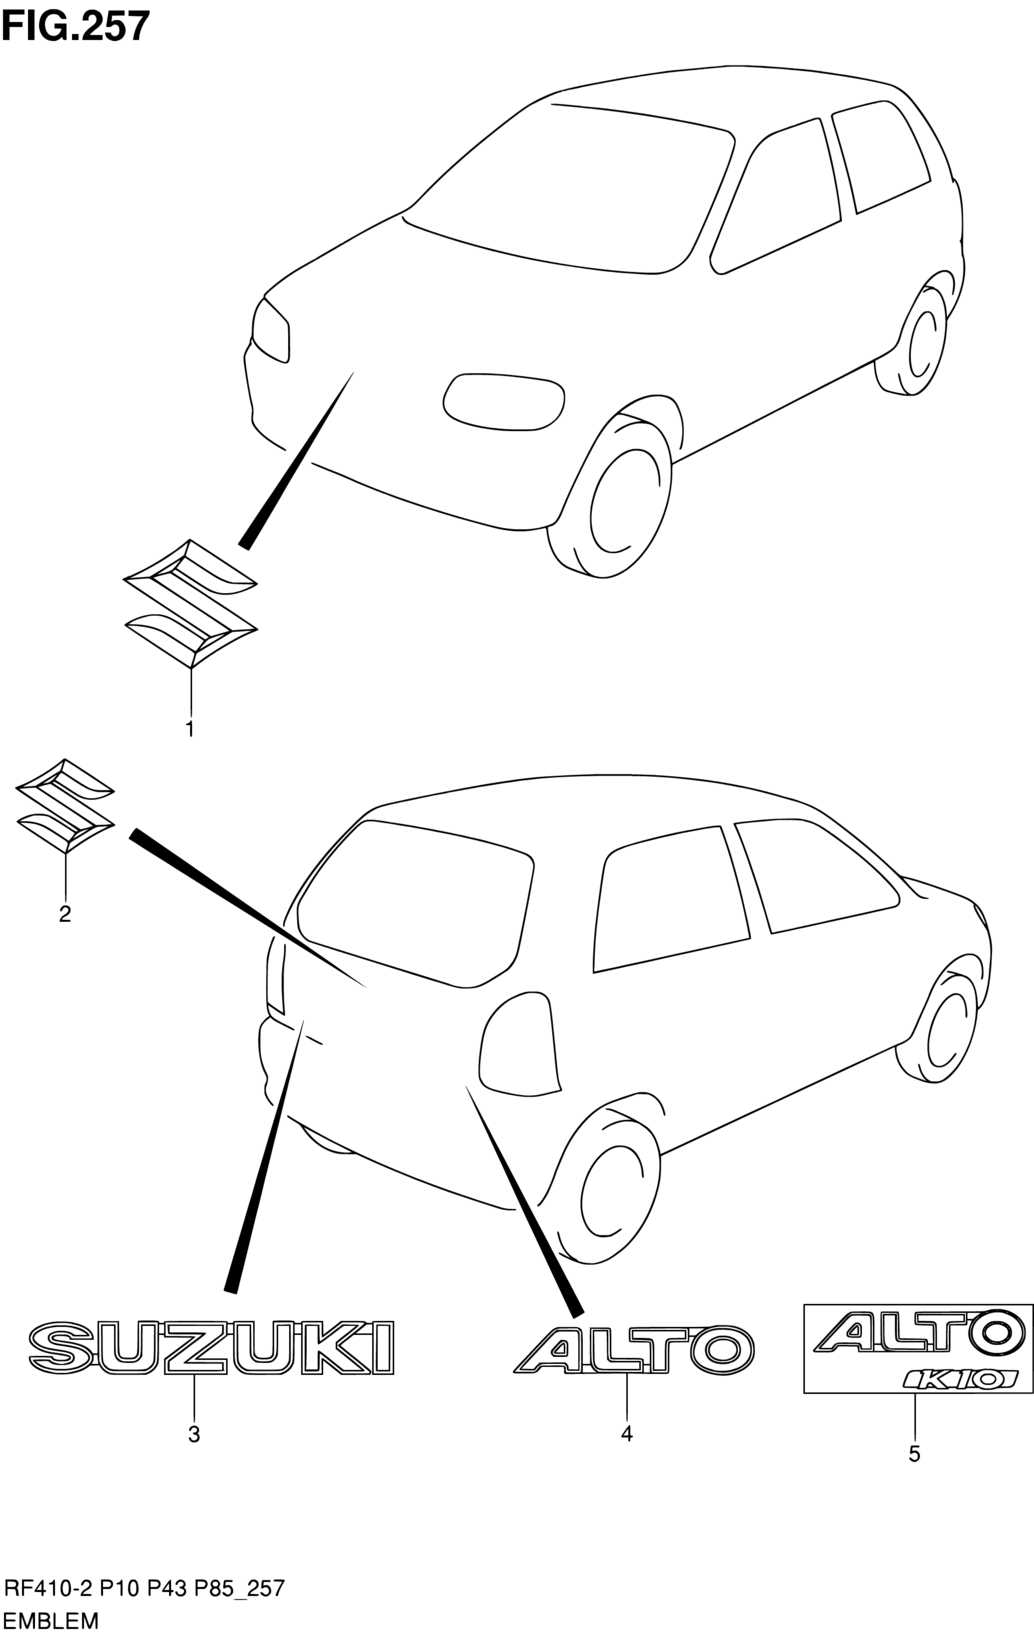 suzuki alto wiring diagram database Maruti Alto K10 africa alto a star celerio 800 rf308 2 body 257 suzuki alto 2013 code part number